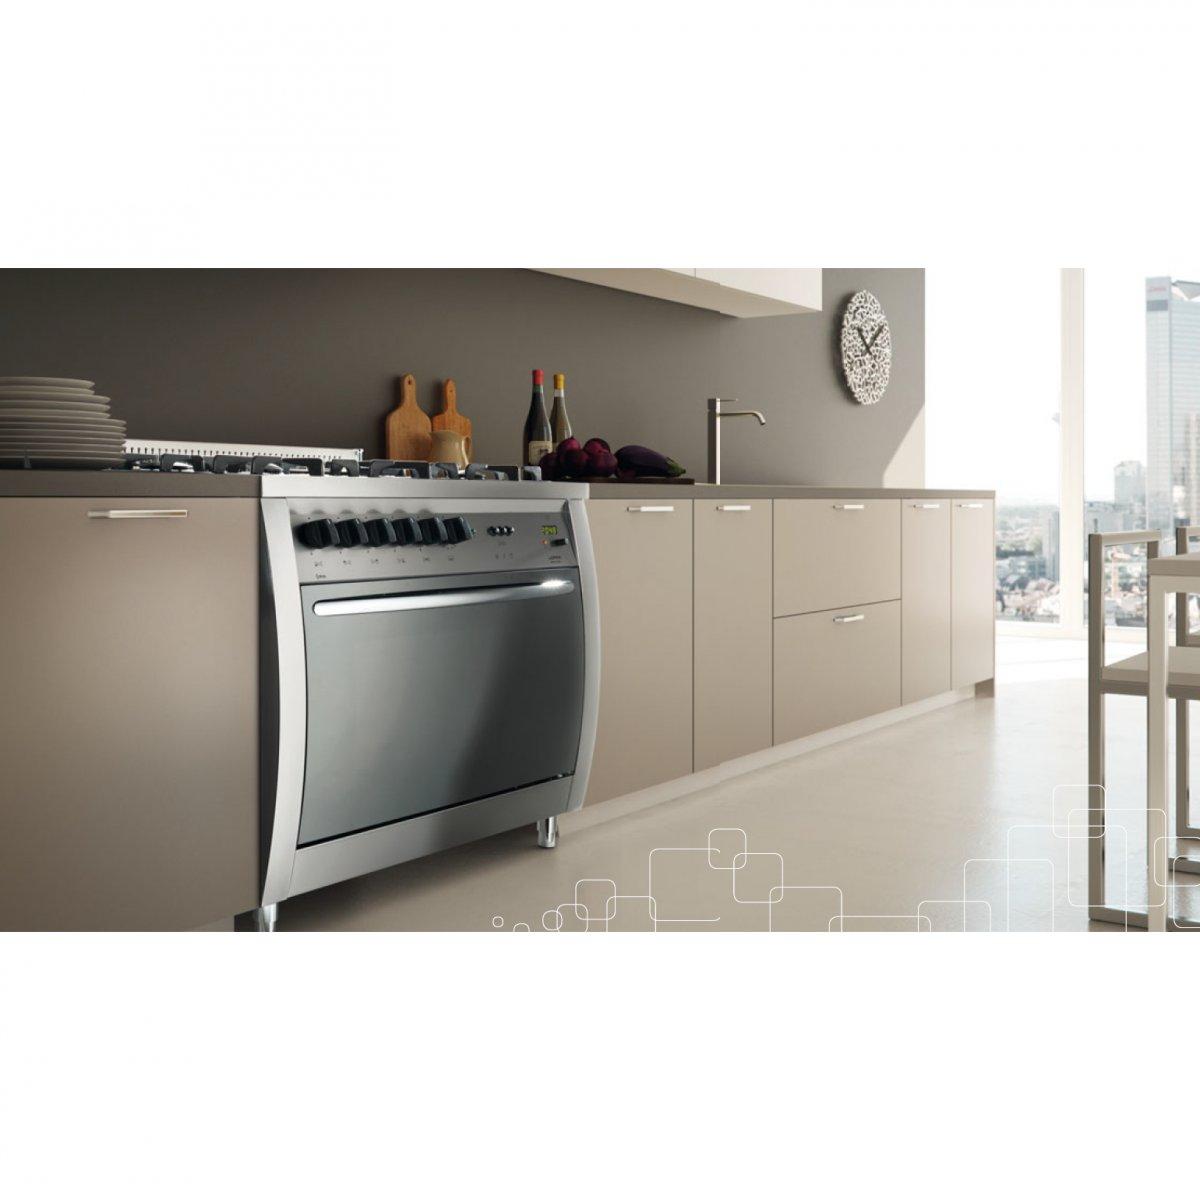 Lofra cucina curva 70 inox forno gas c76gvc lofra elettrodomestici cucine - Elettrodomestici cucina a gas ...